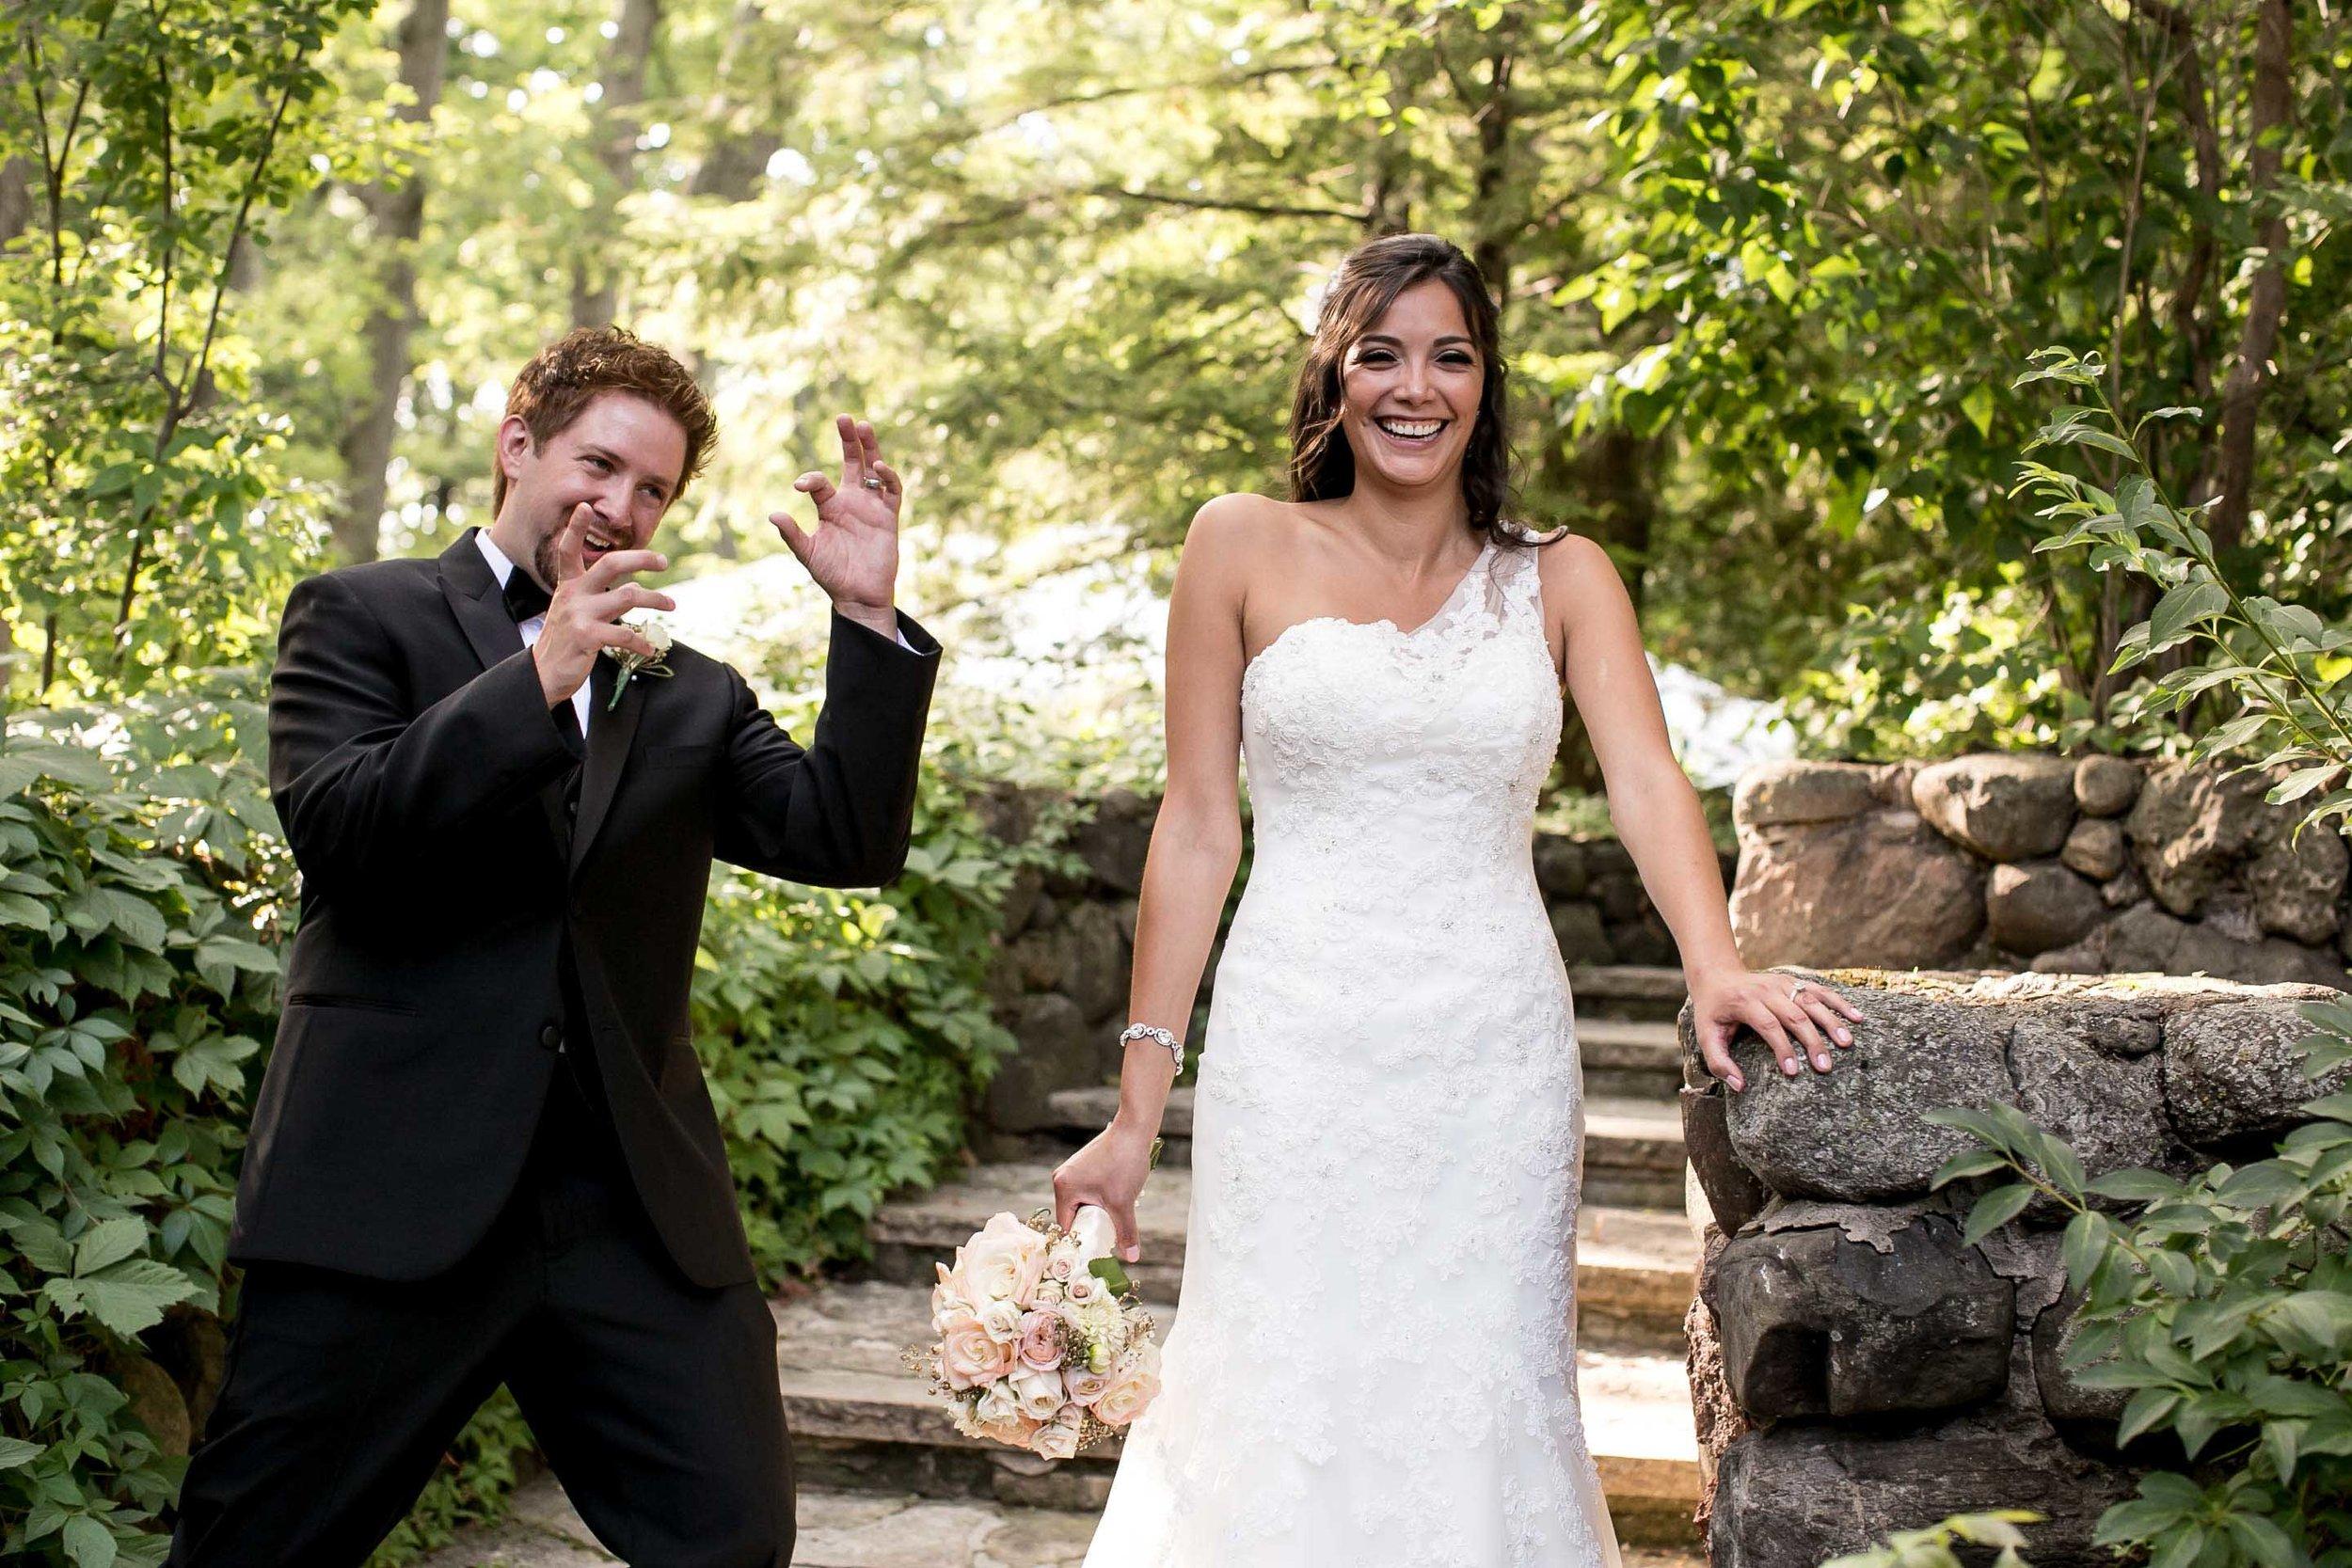 Destination Photographer wedding photos Best Wedding Photography Rose Photo -24.jpg